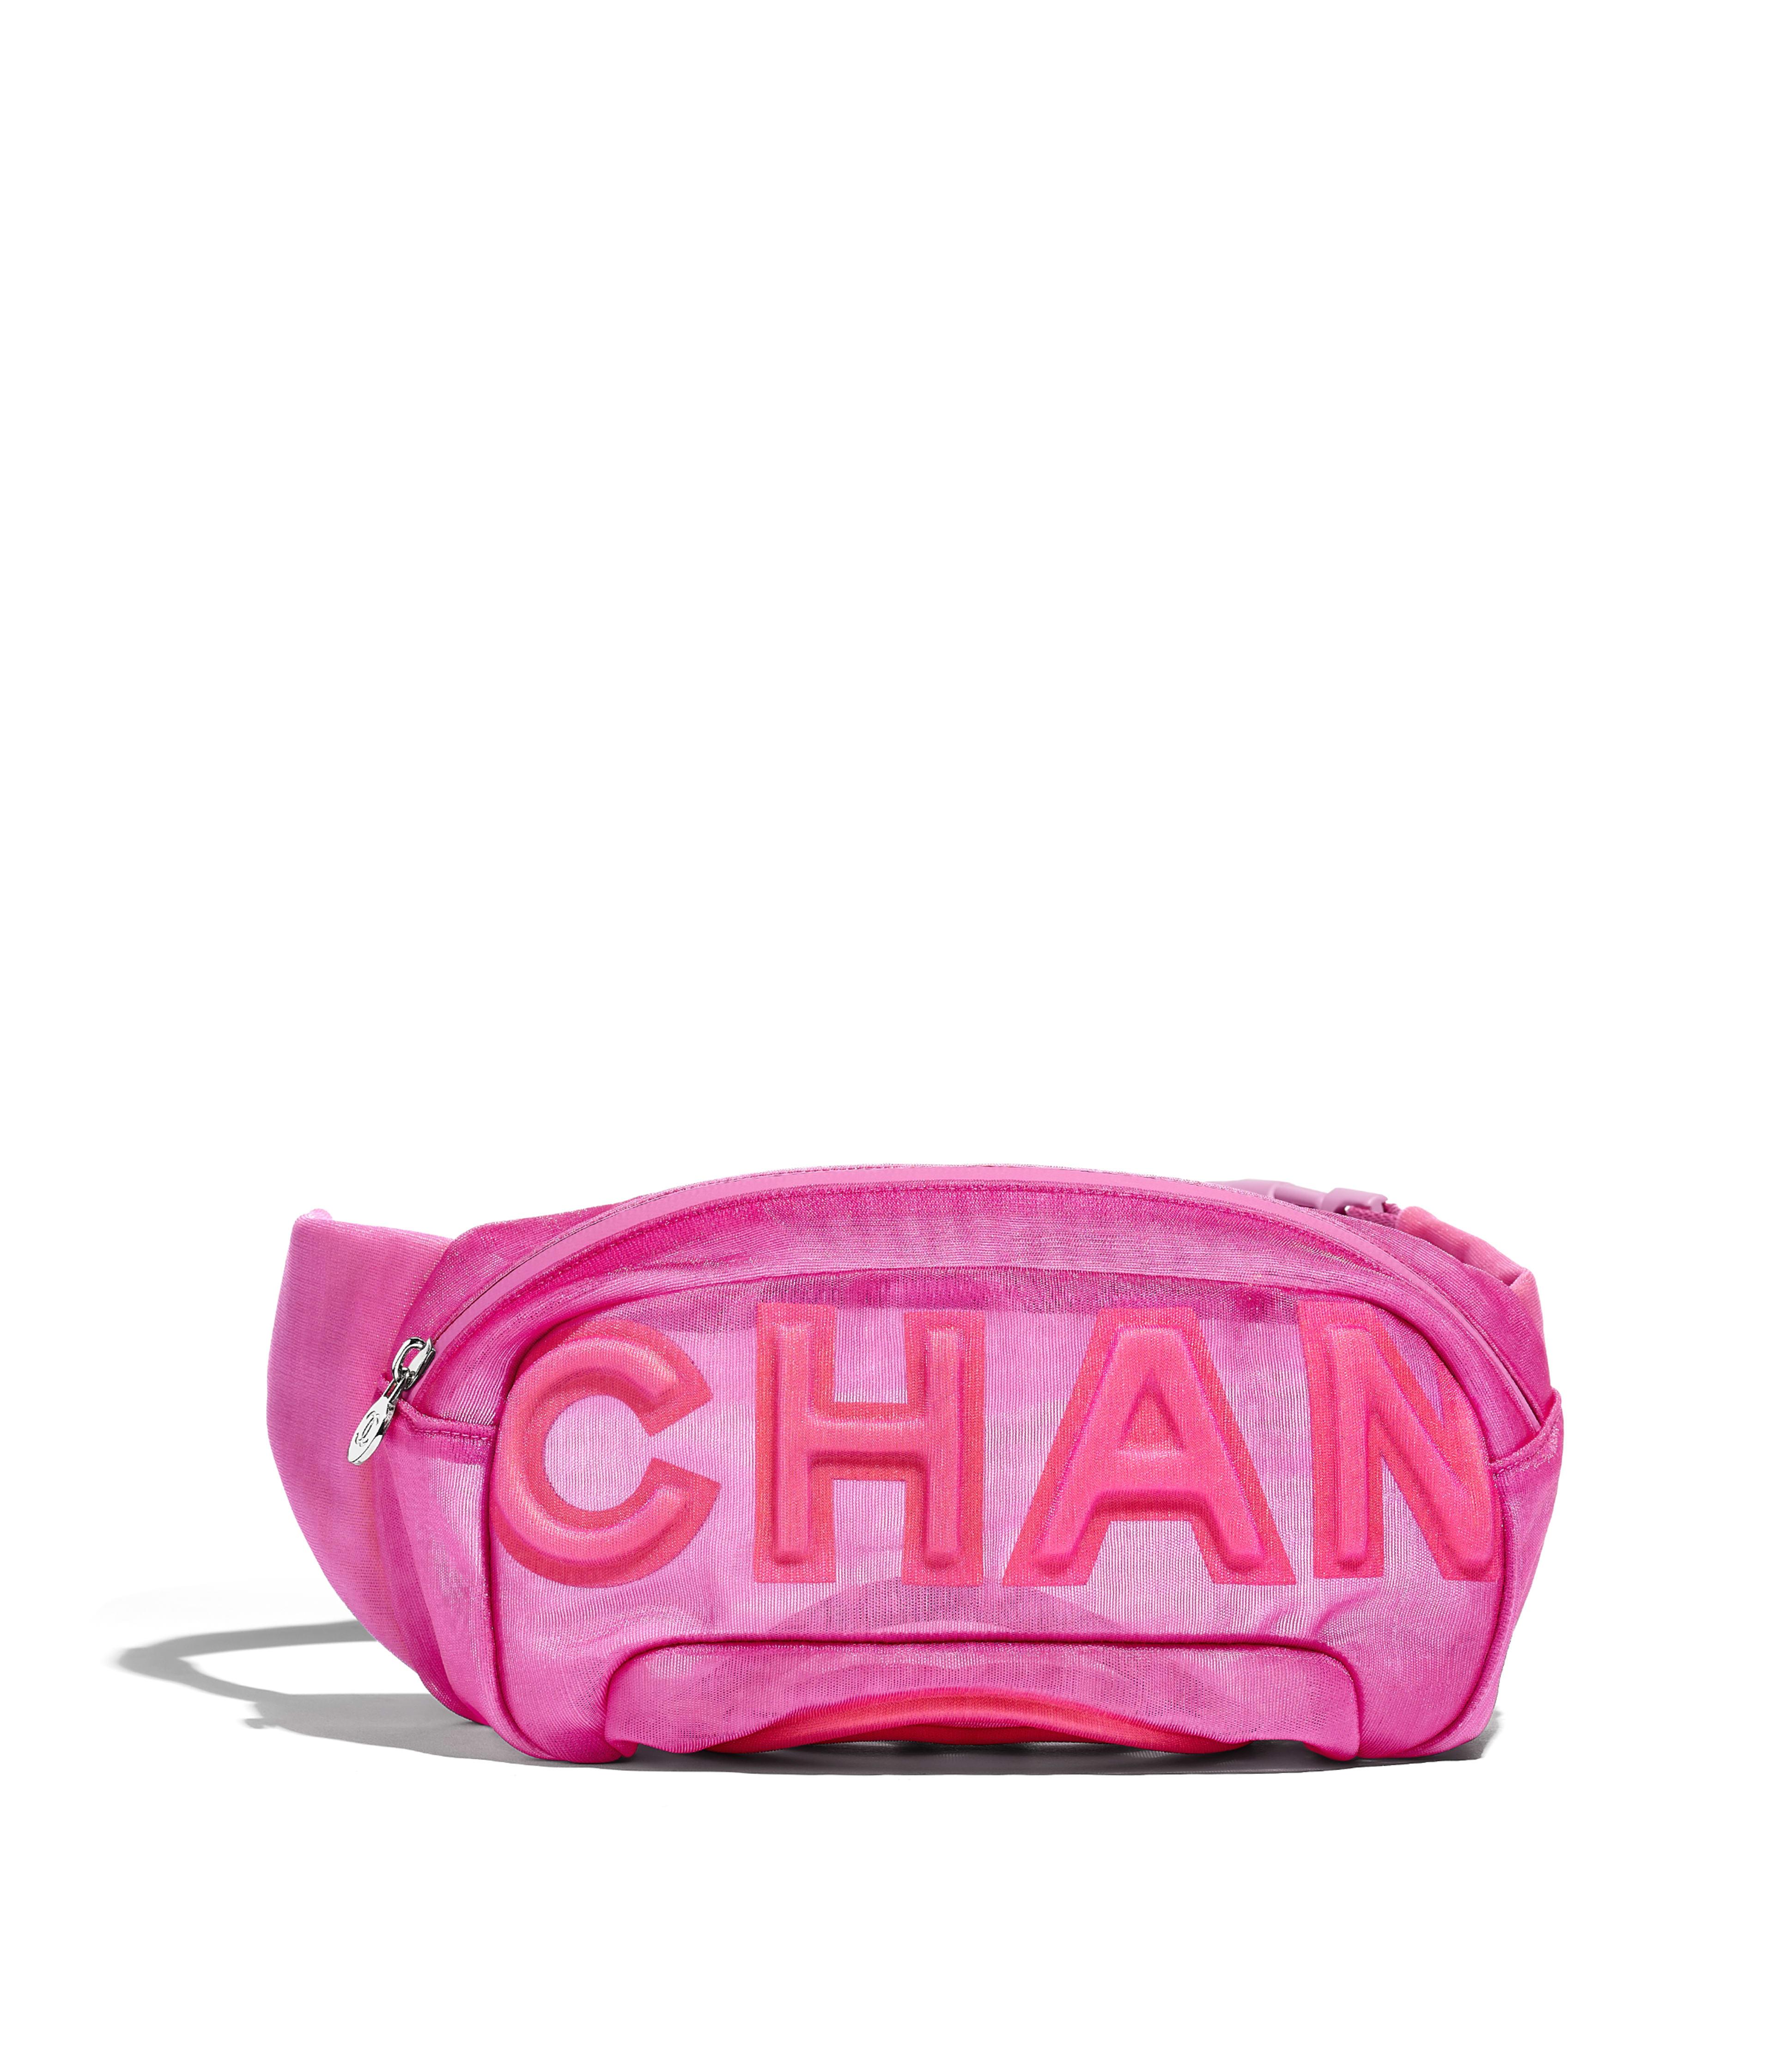 120d53dfbd2f80 Waist Bag Nylon & Silver-Tone Metal, Pink Ref. AS0425B00165N0799